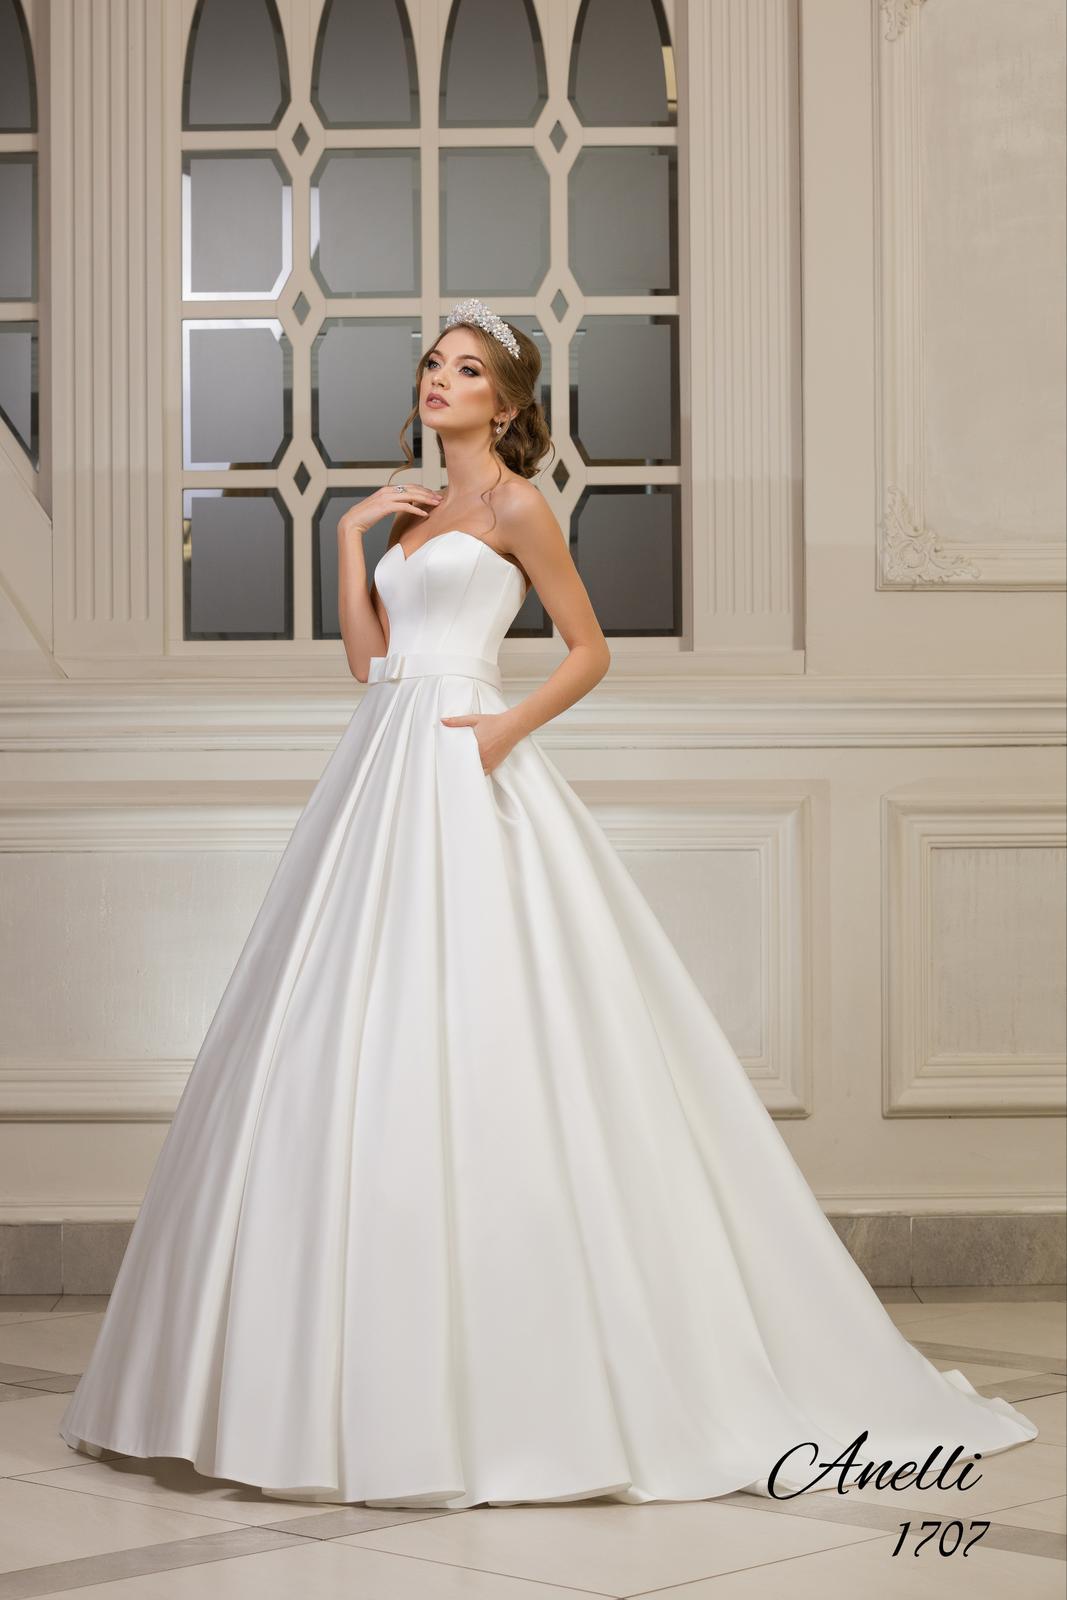 Svadobné šaty - Debut 1707 - Obrázok č. 3